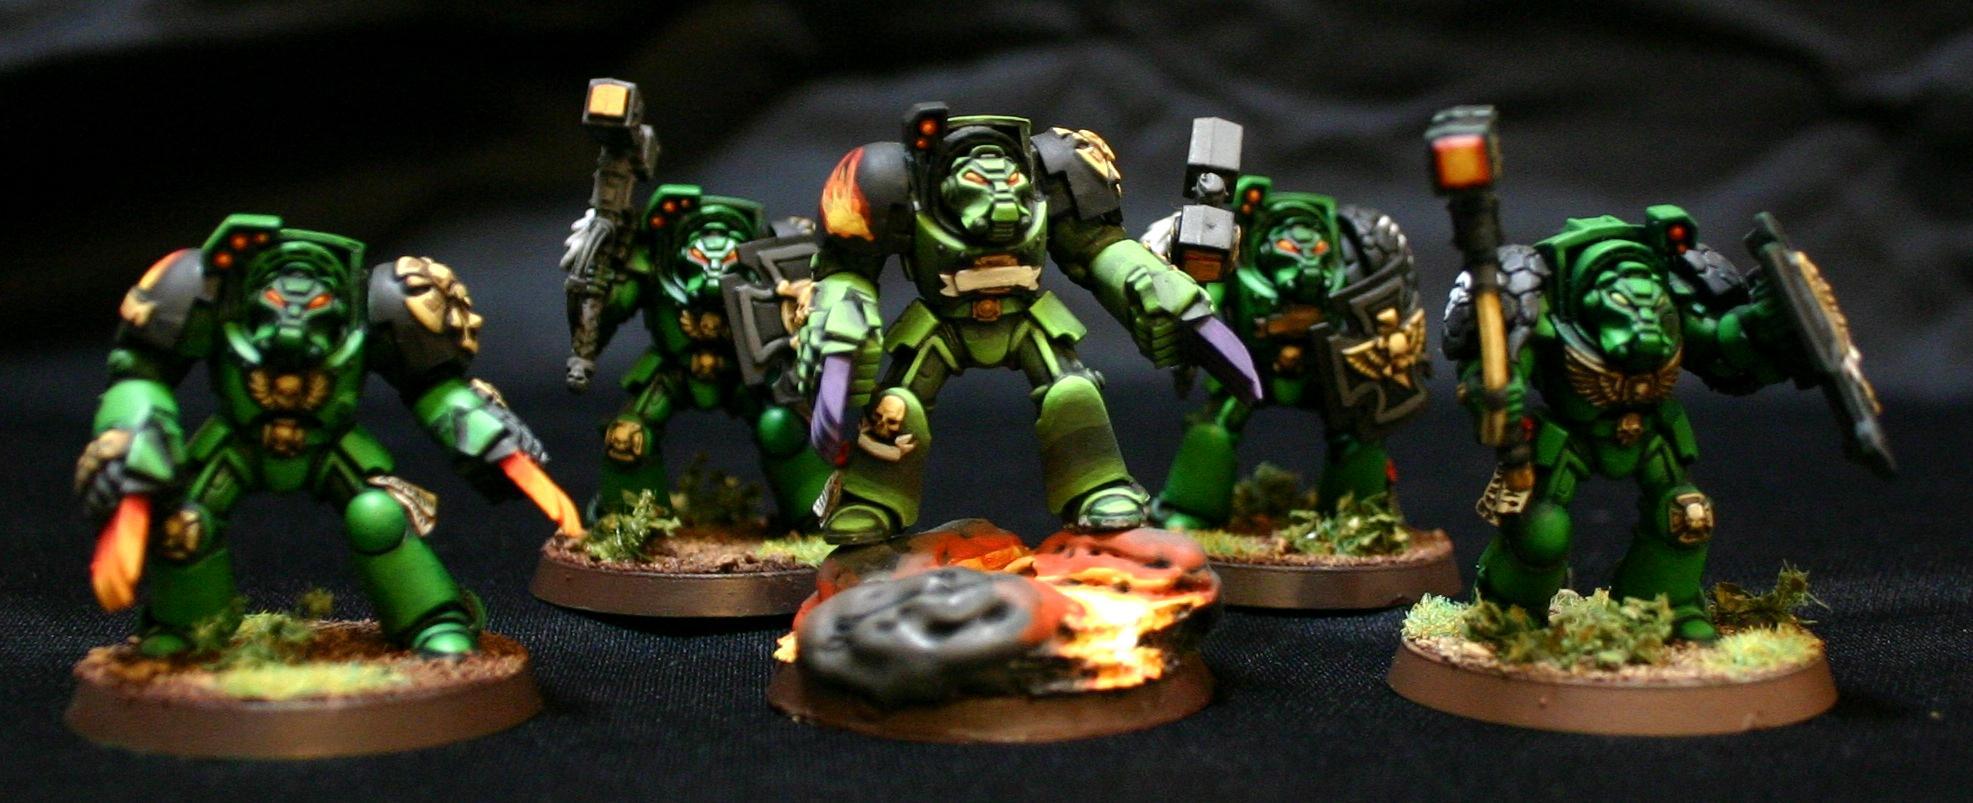 Assault, Salamanders, Space Marines, Terminator Armor, Warhammer 40,000